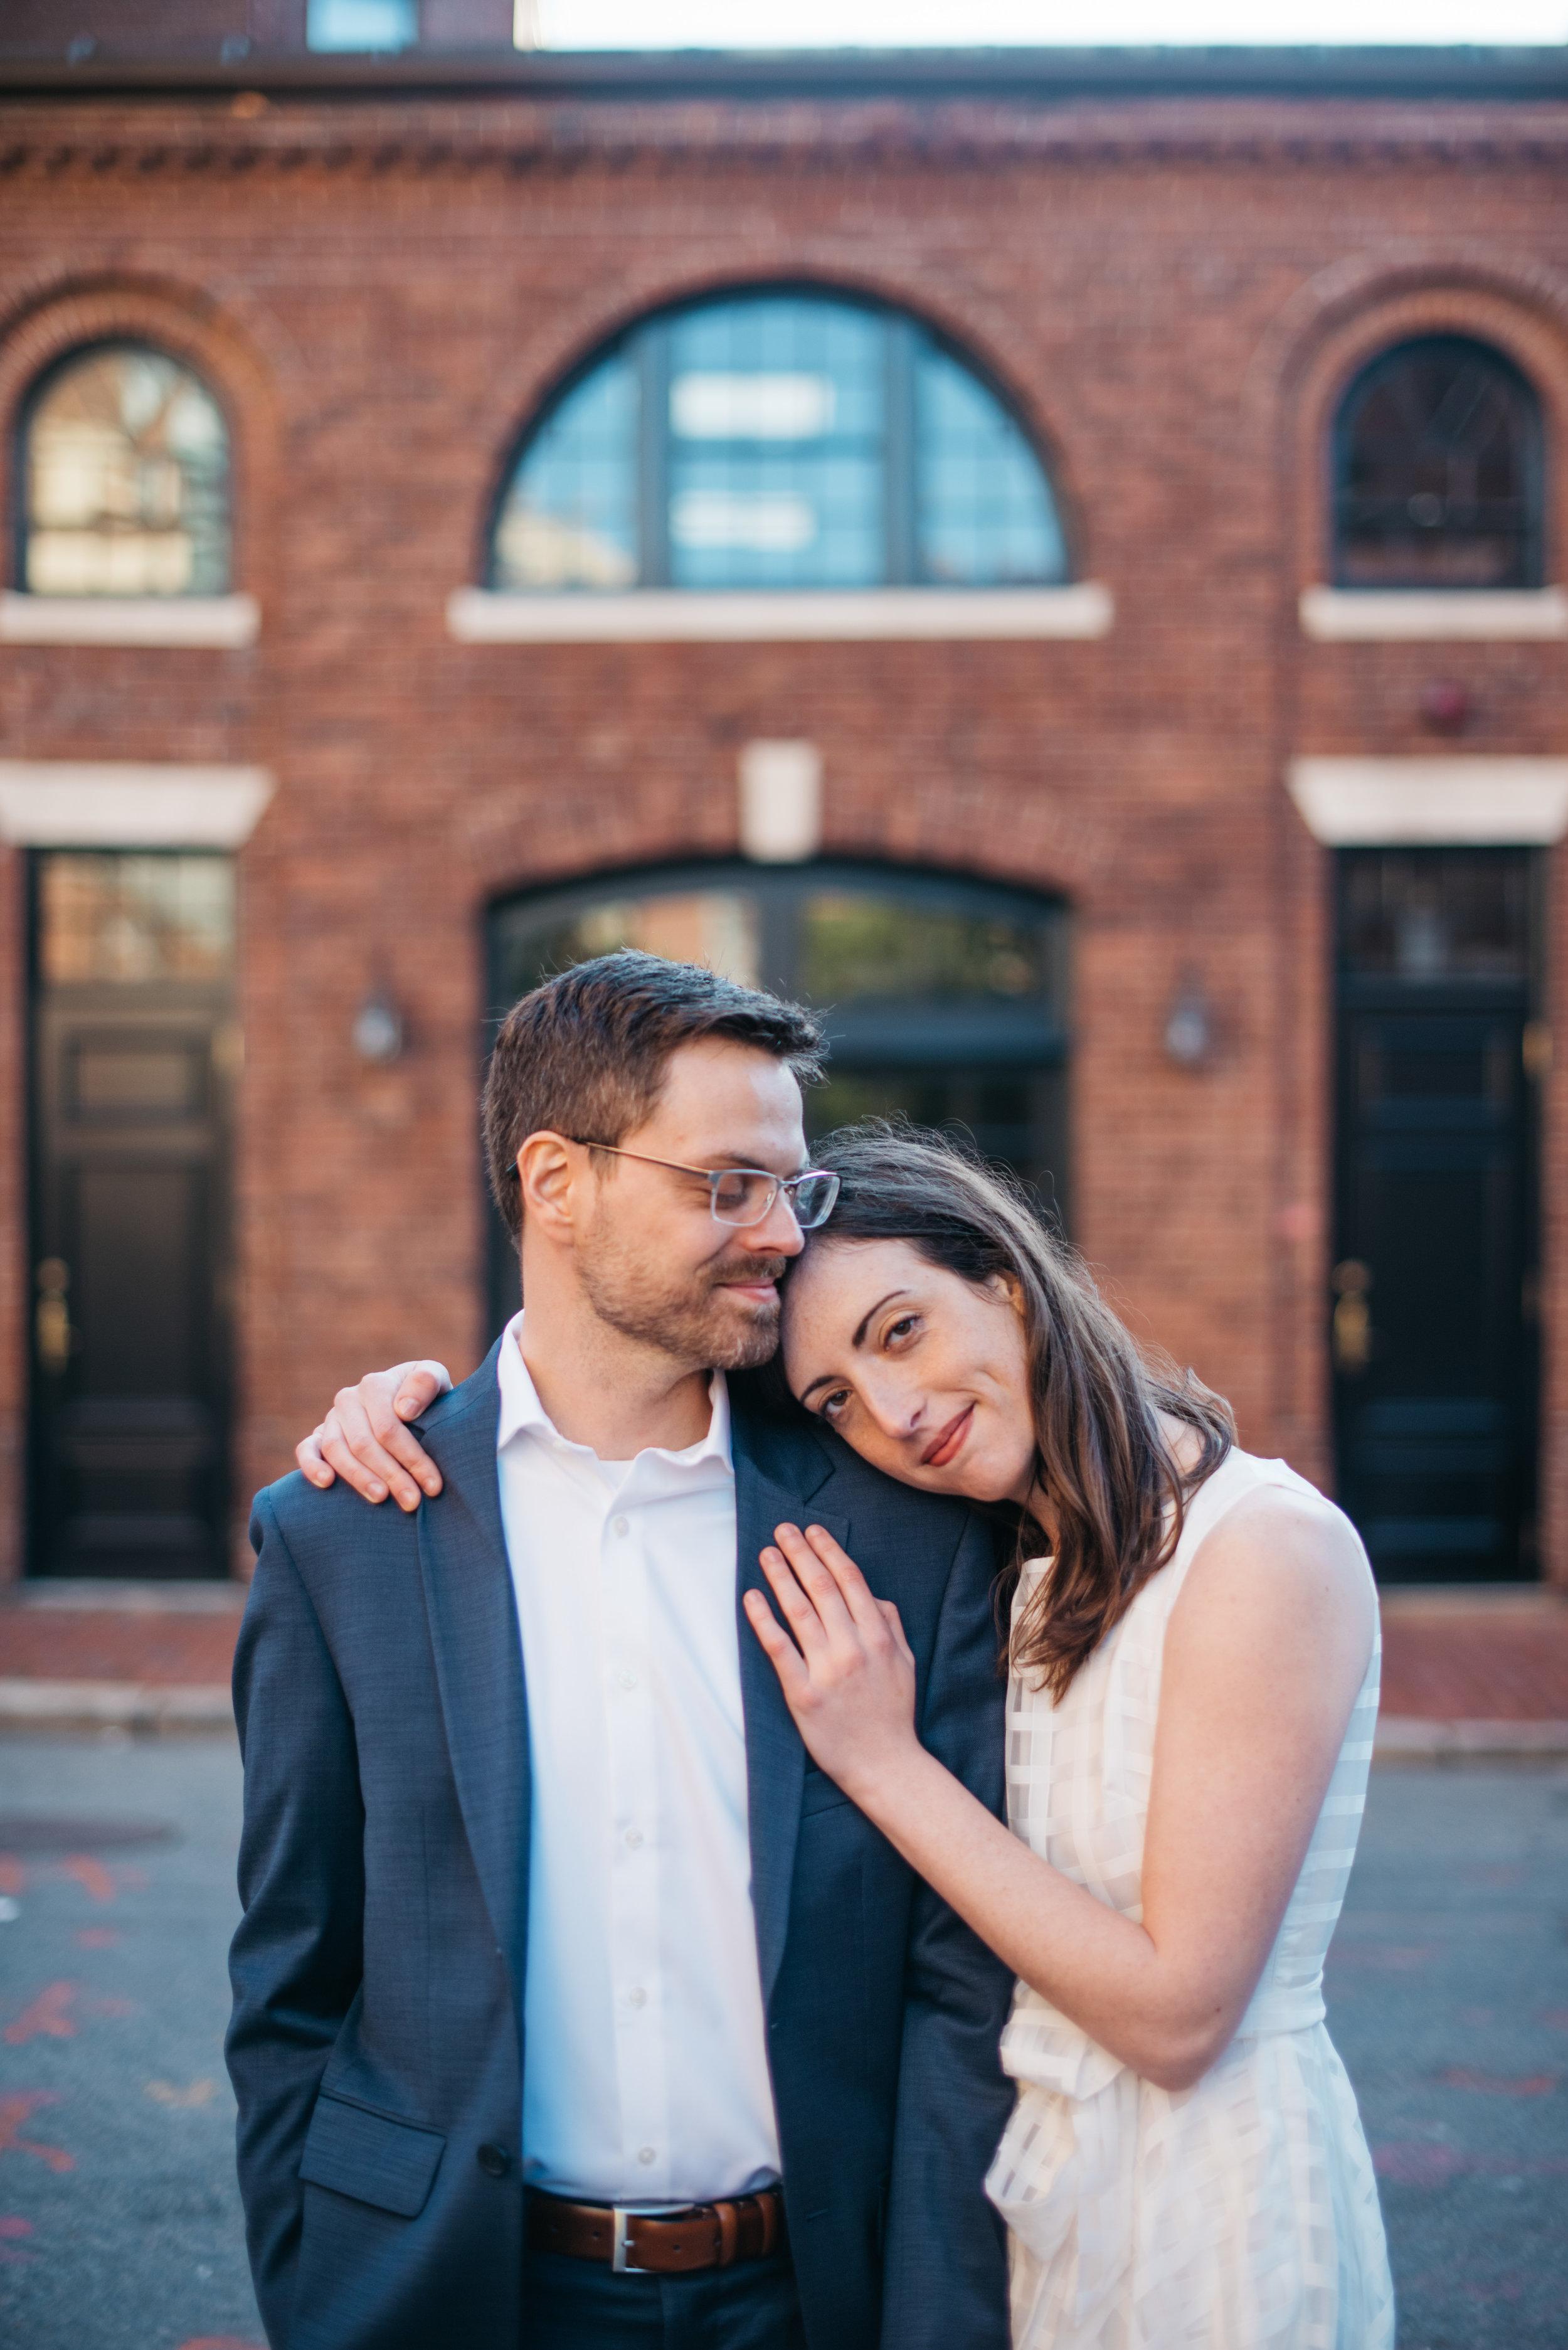 erika aileen boston wedding photographer beacon hill portrait session